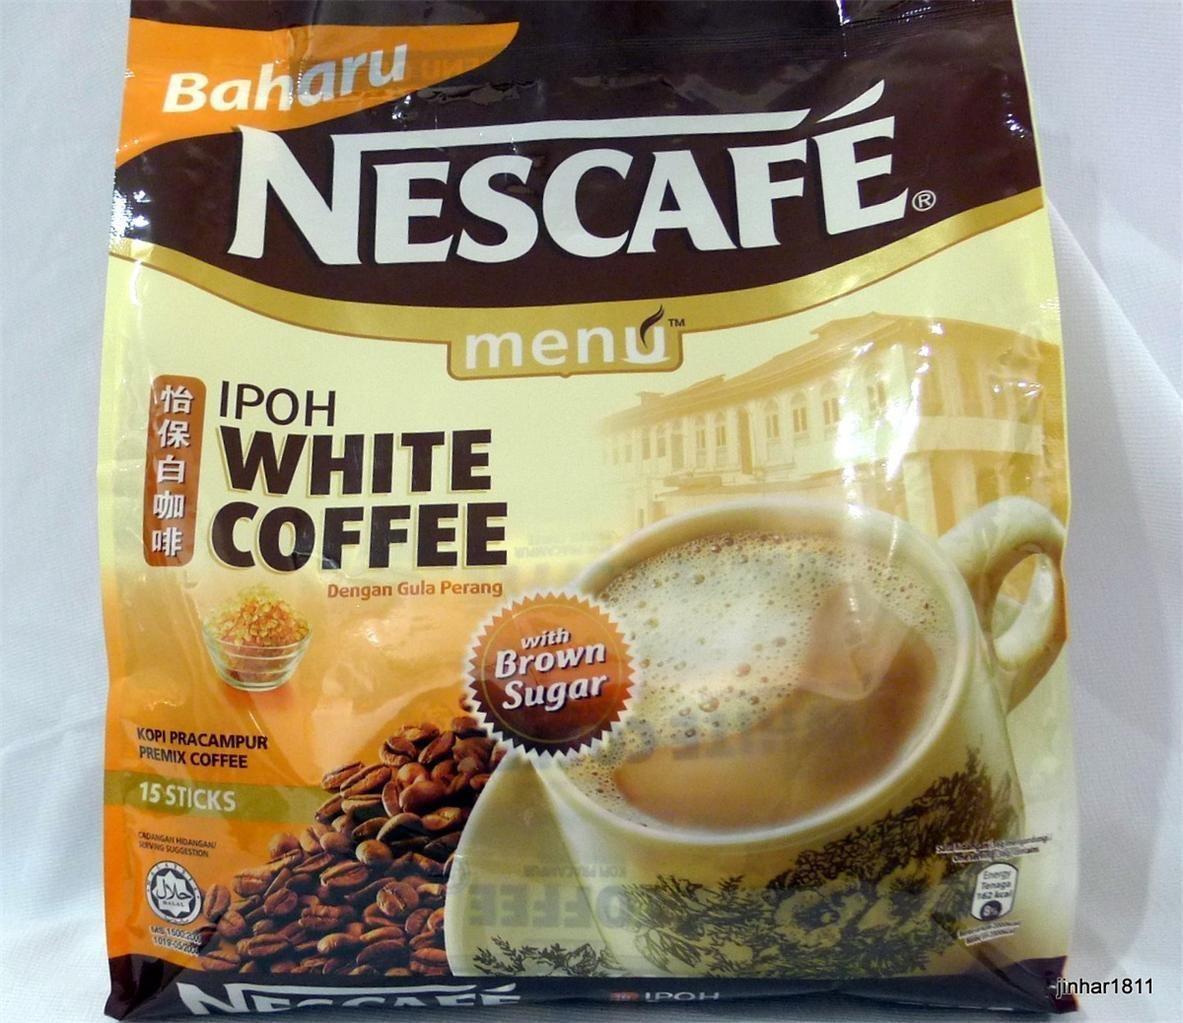 1 Bag Nescafe Oh So Dreamy Ipoh White Coffee Brown Sugar Free Kopi Wihte Pack Menu Premix Express Shipping